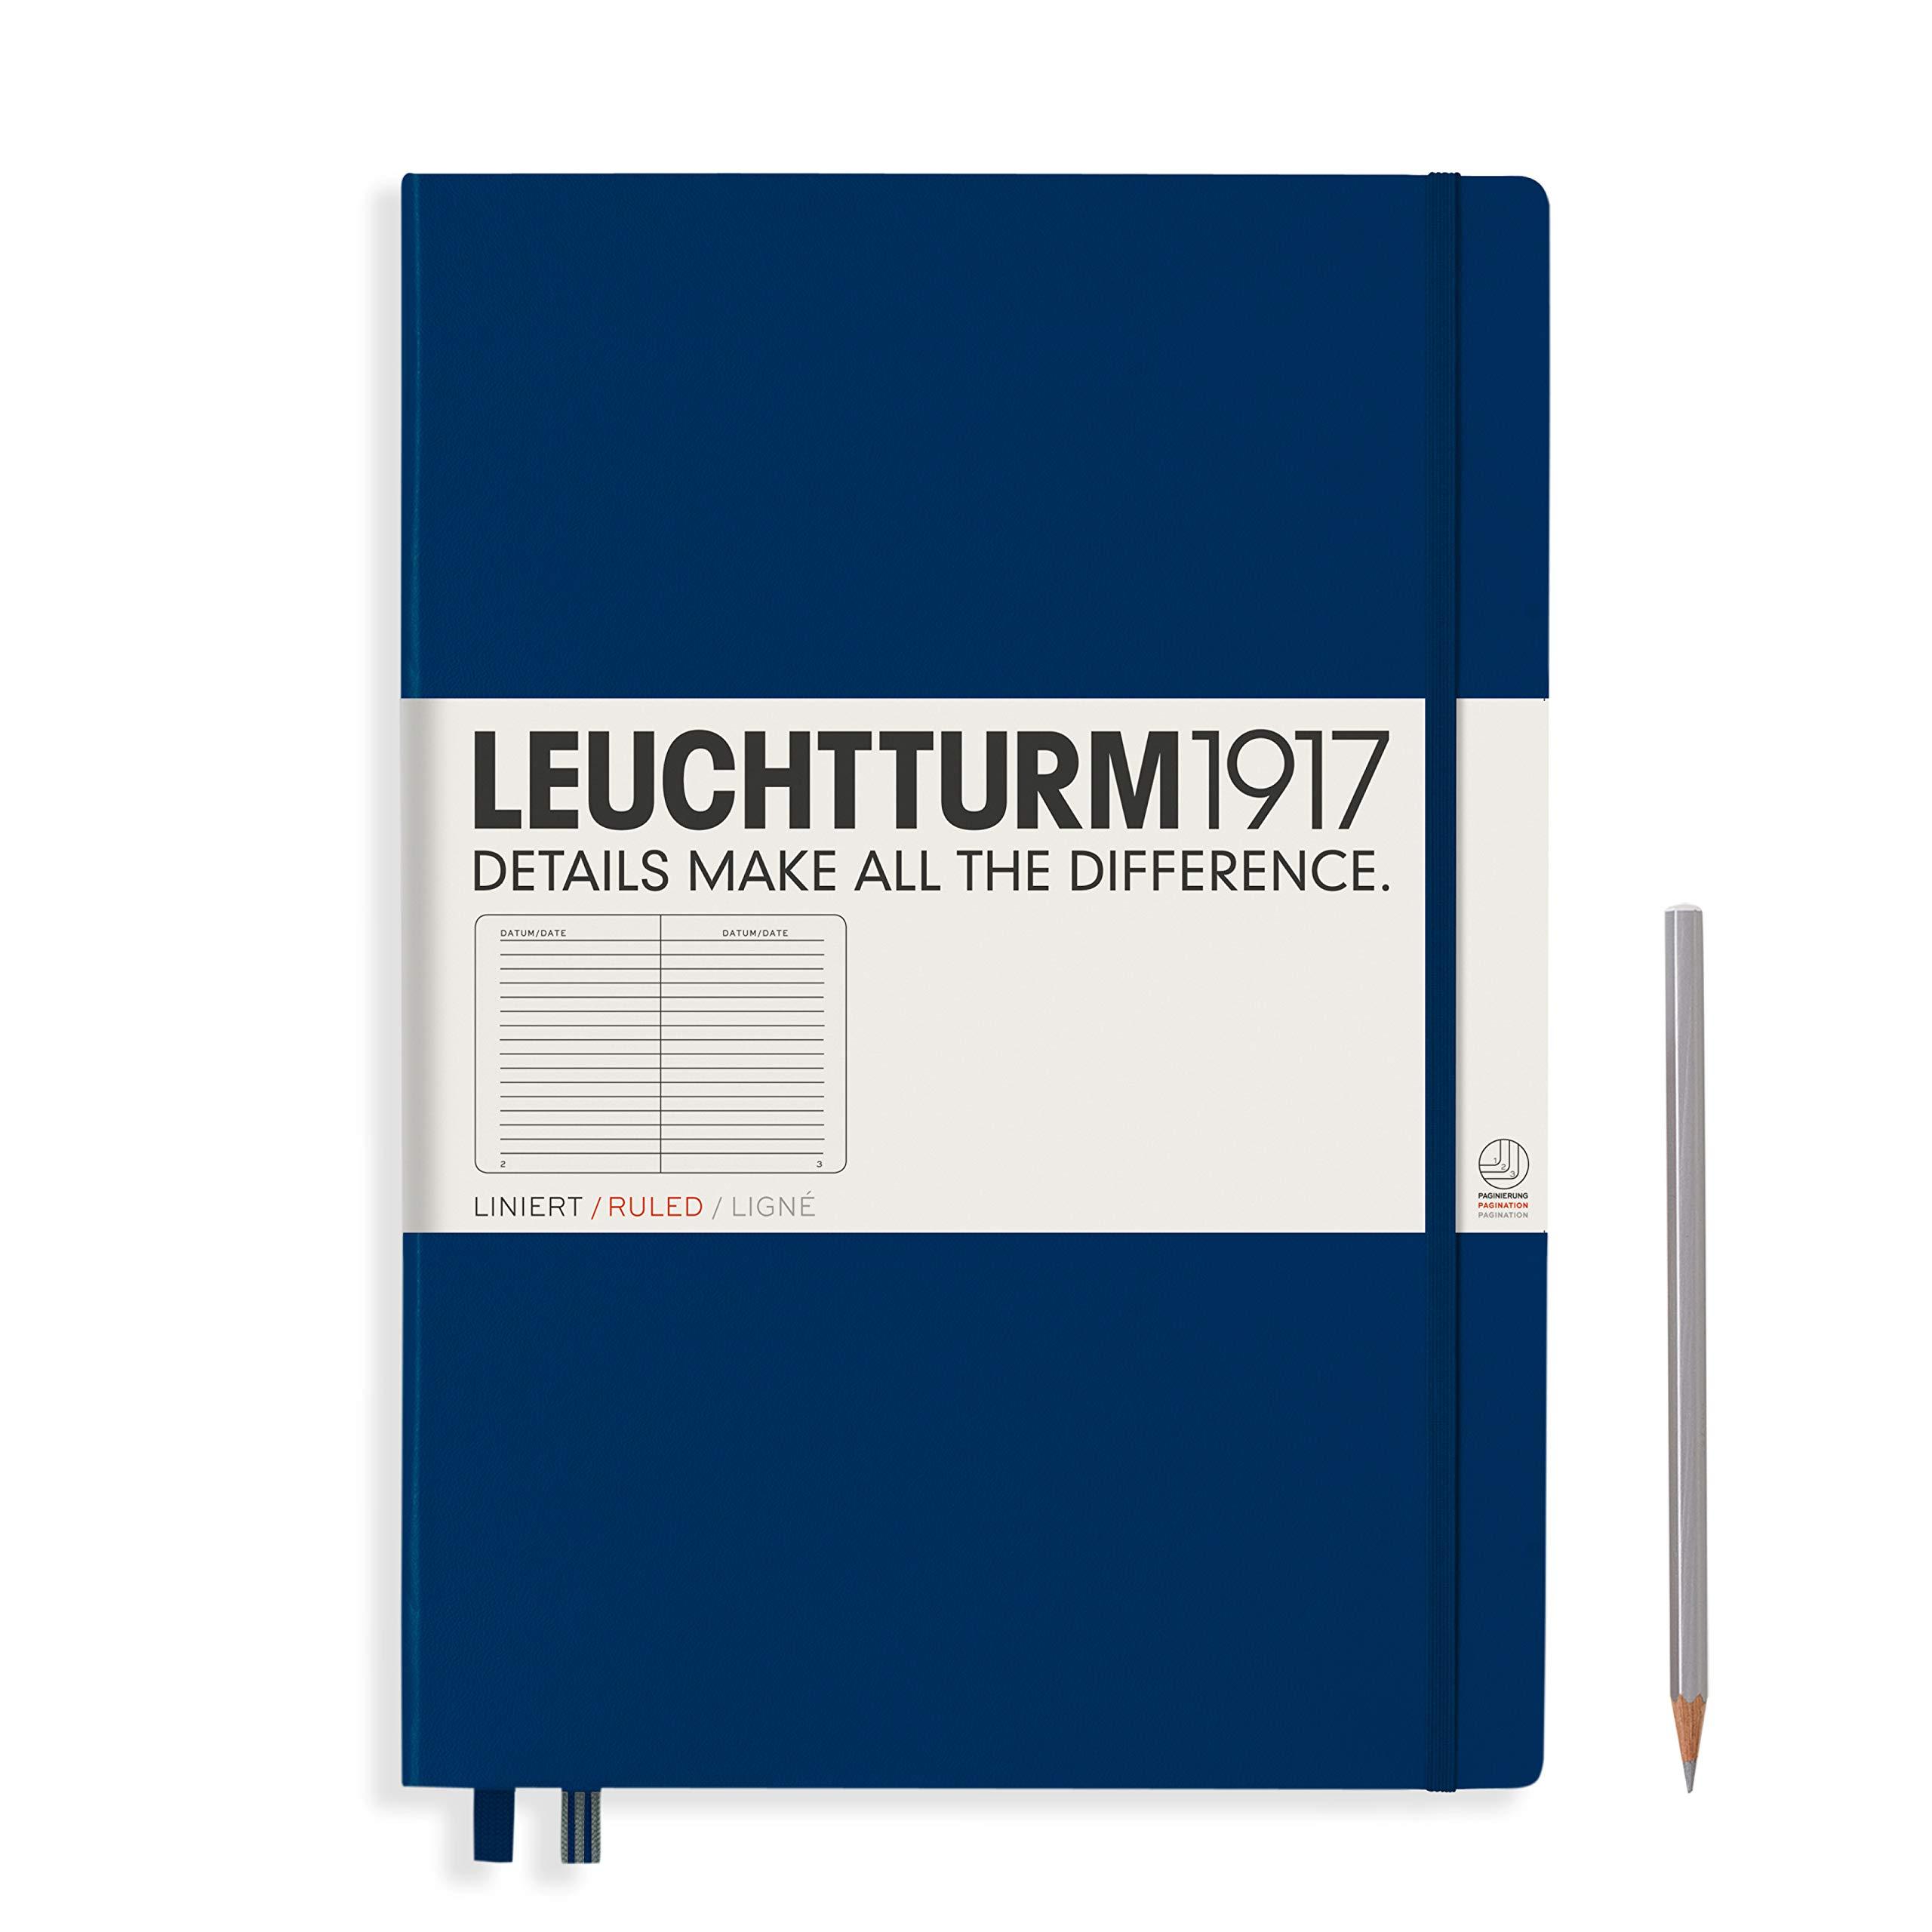 Leuchtturm1917 Navy, Master Classic 233 p., ruled